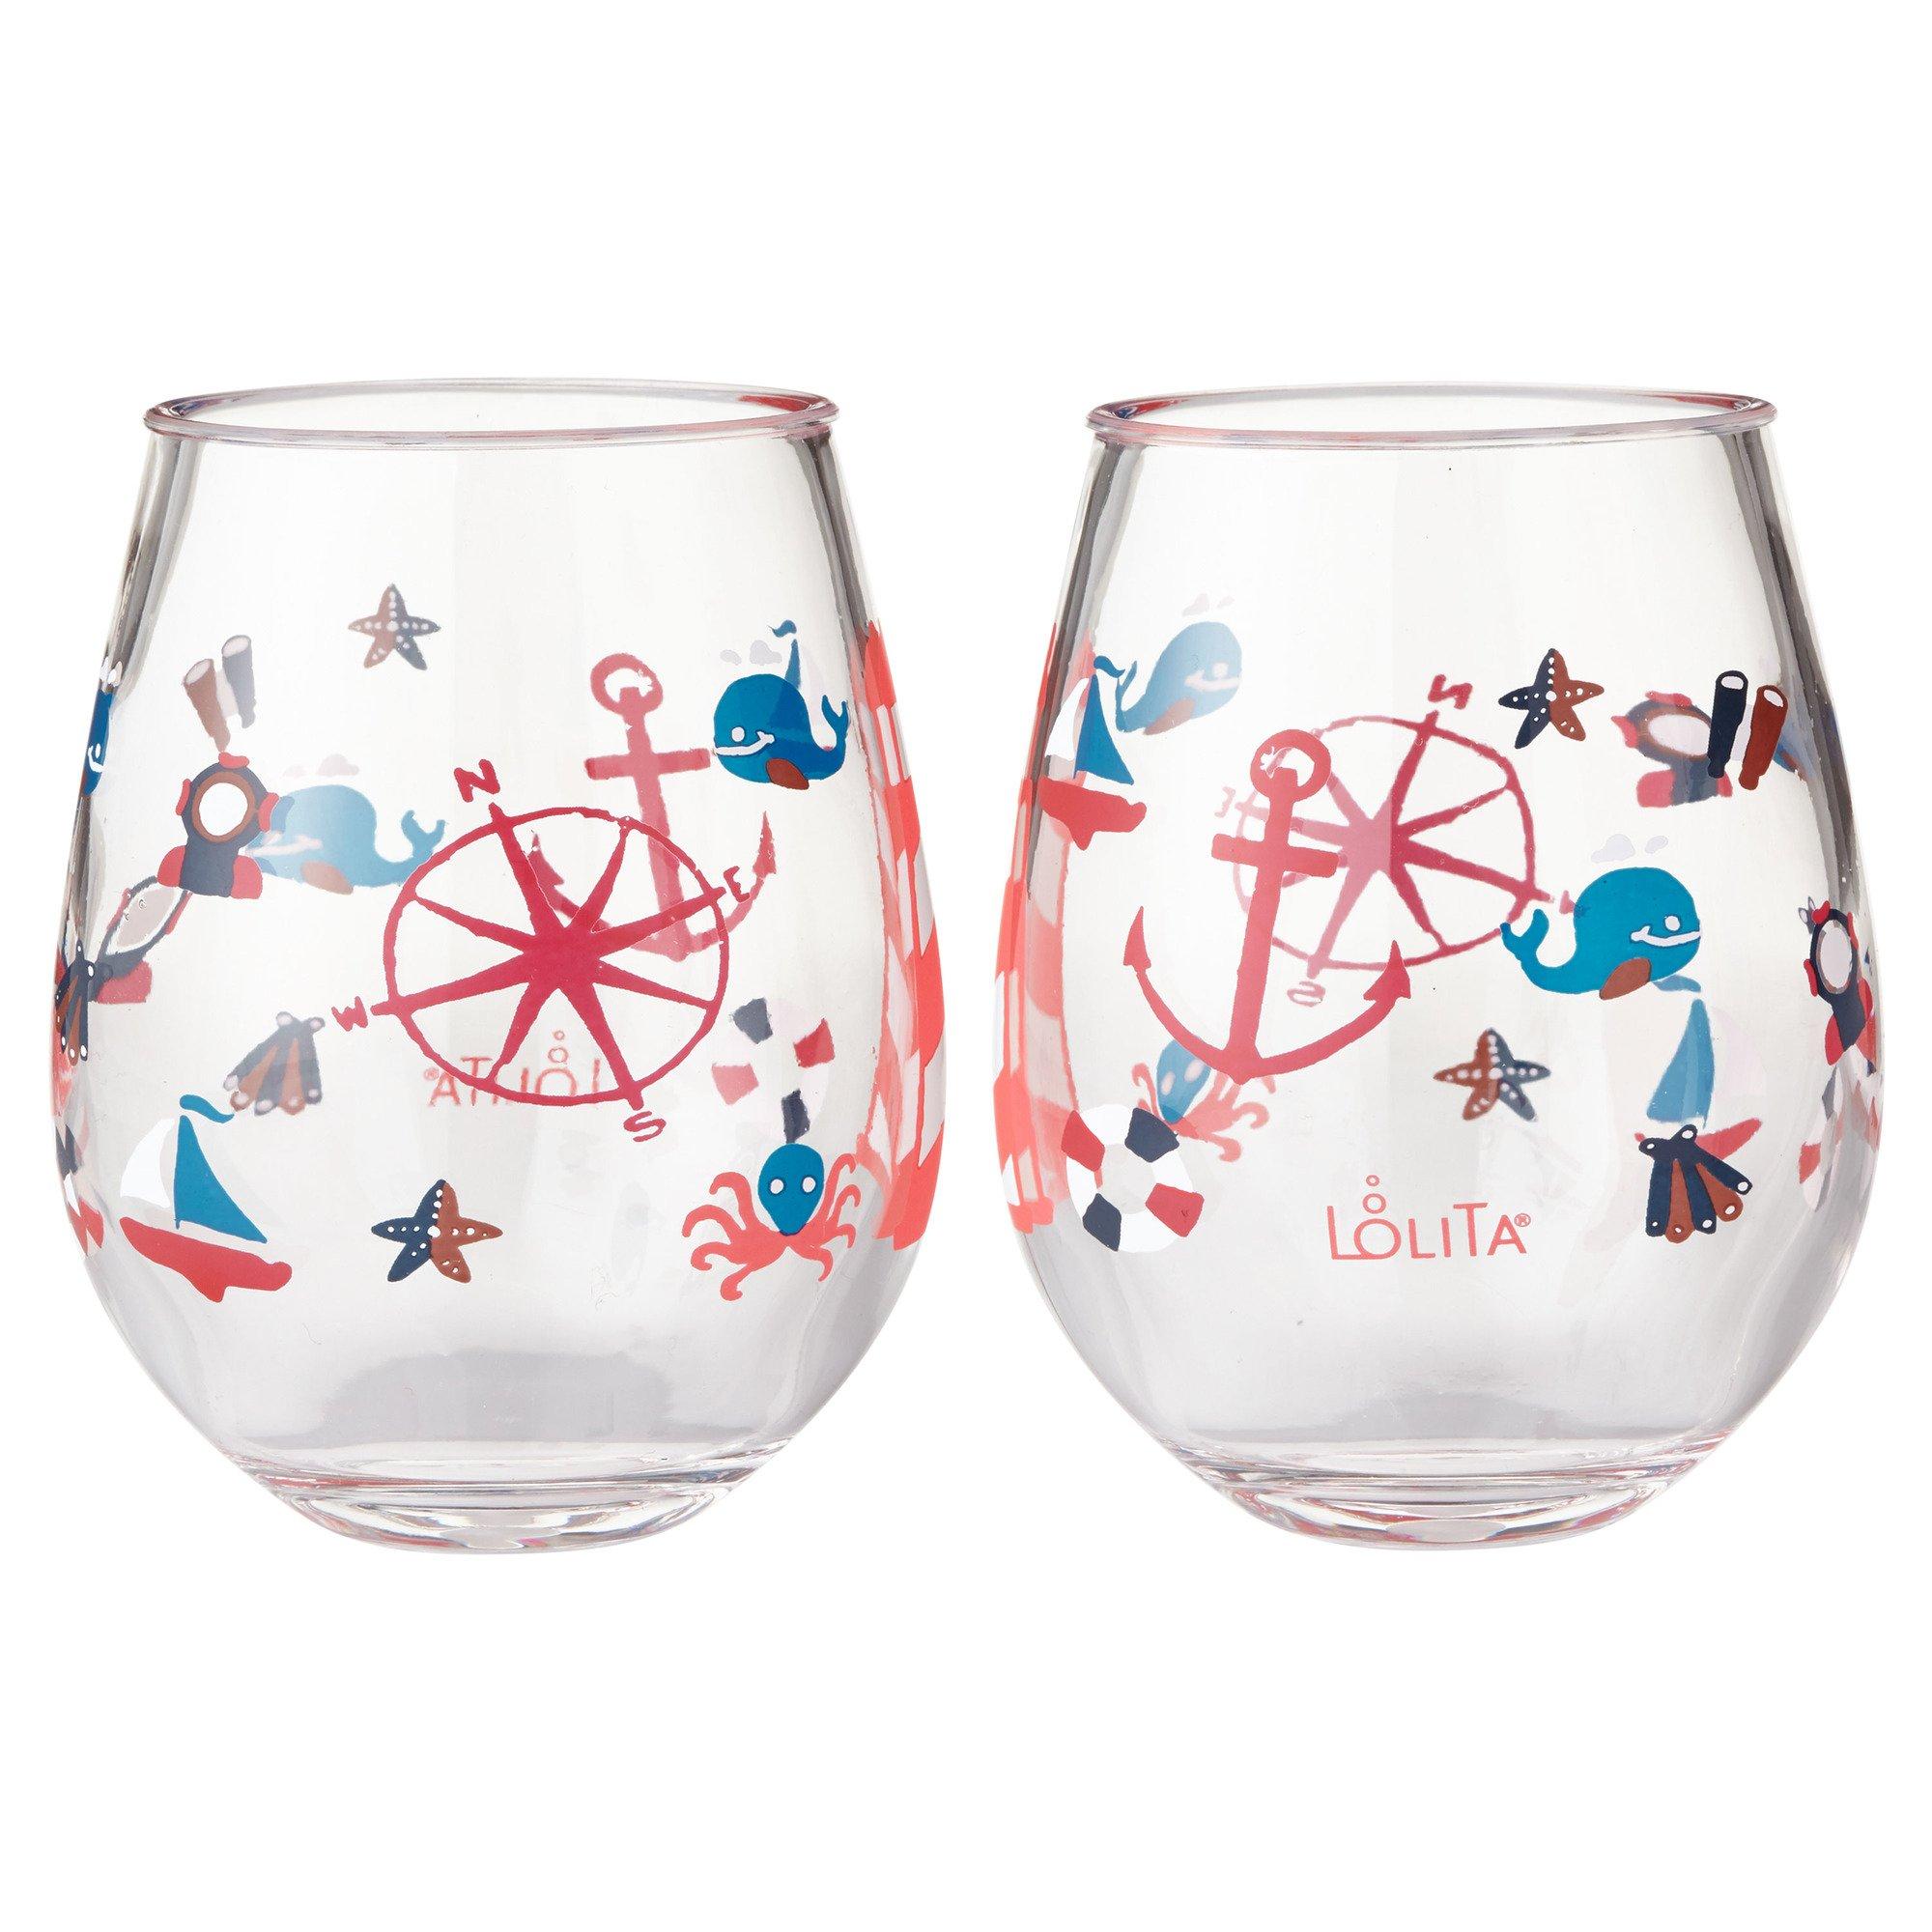 Enesco Designs by Lolita Maritime Acrylic Stemless Wine Glasses, Set of 2, 17 oz.